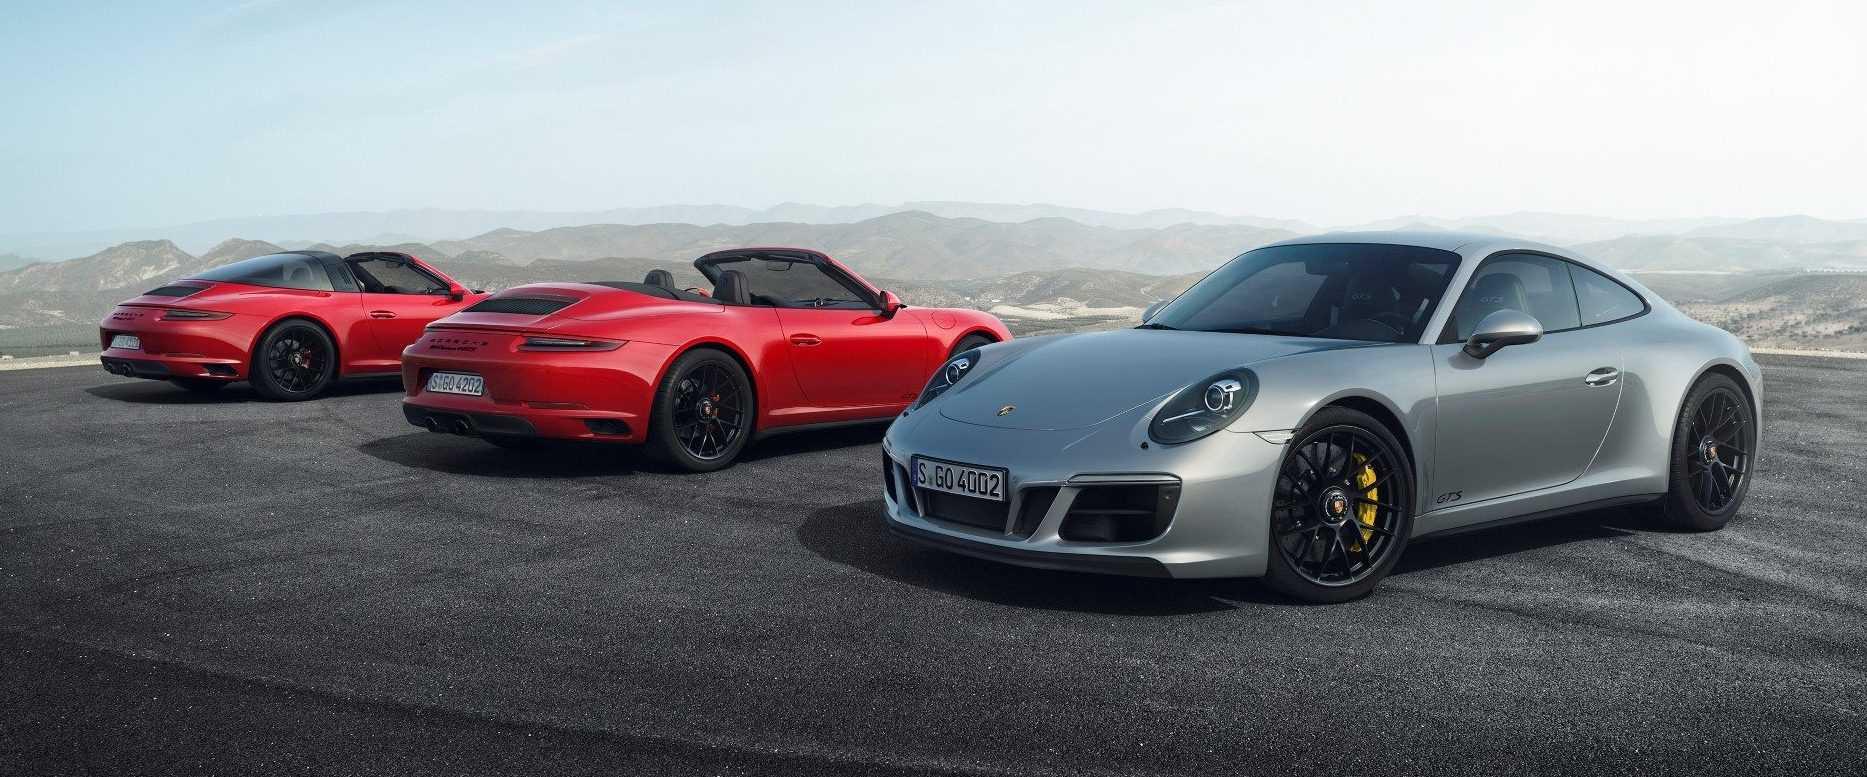 Porsche 911 Carrera GTS range 2017